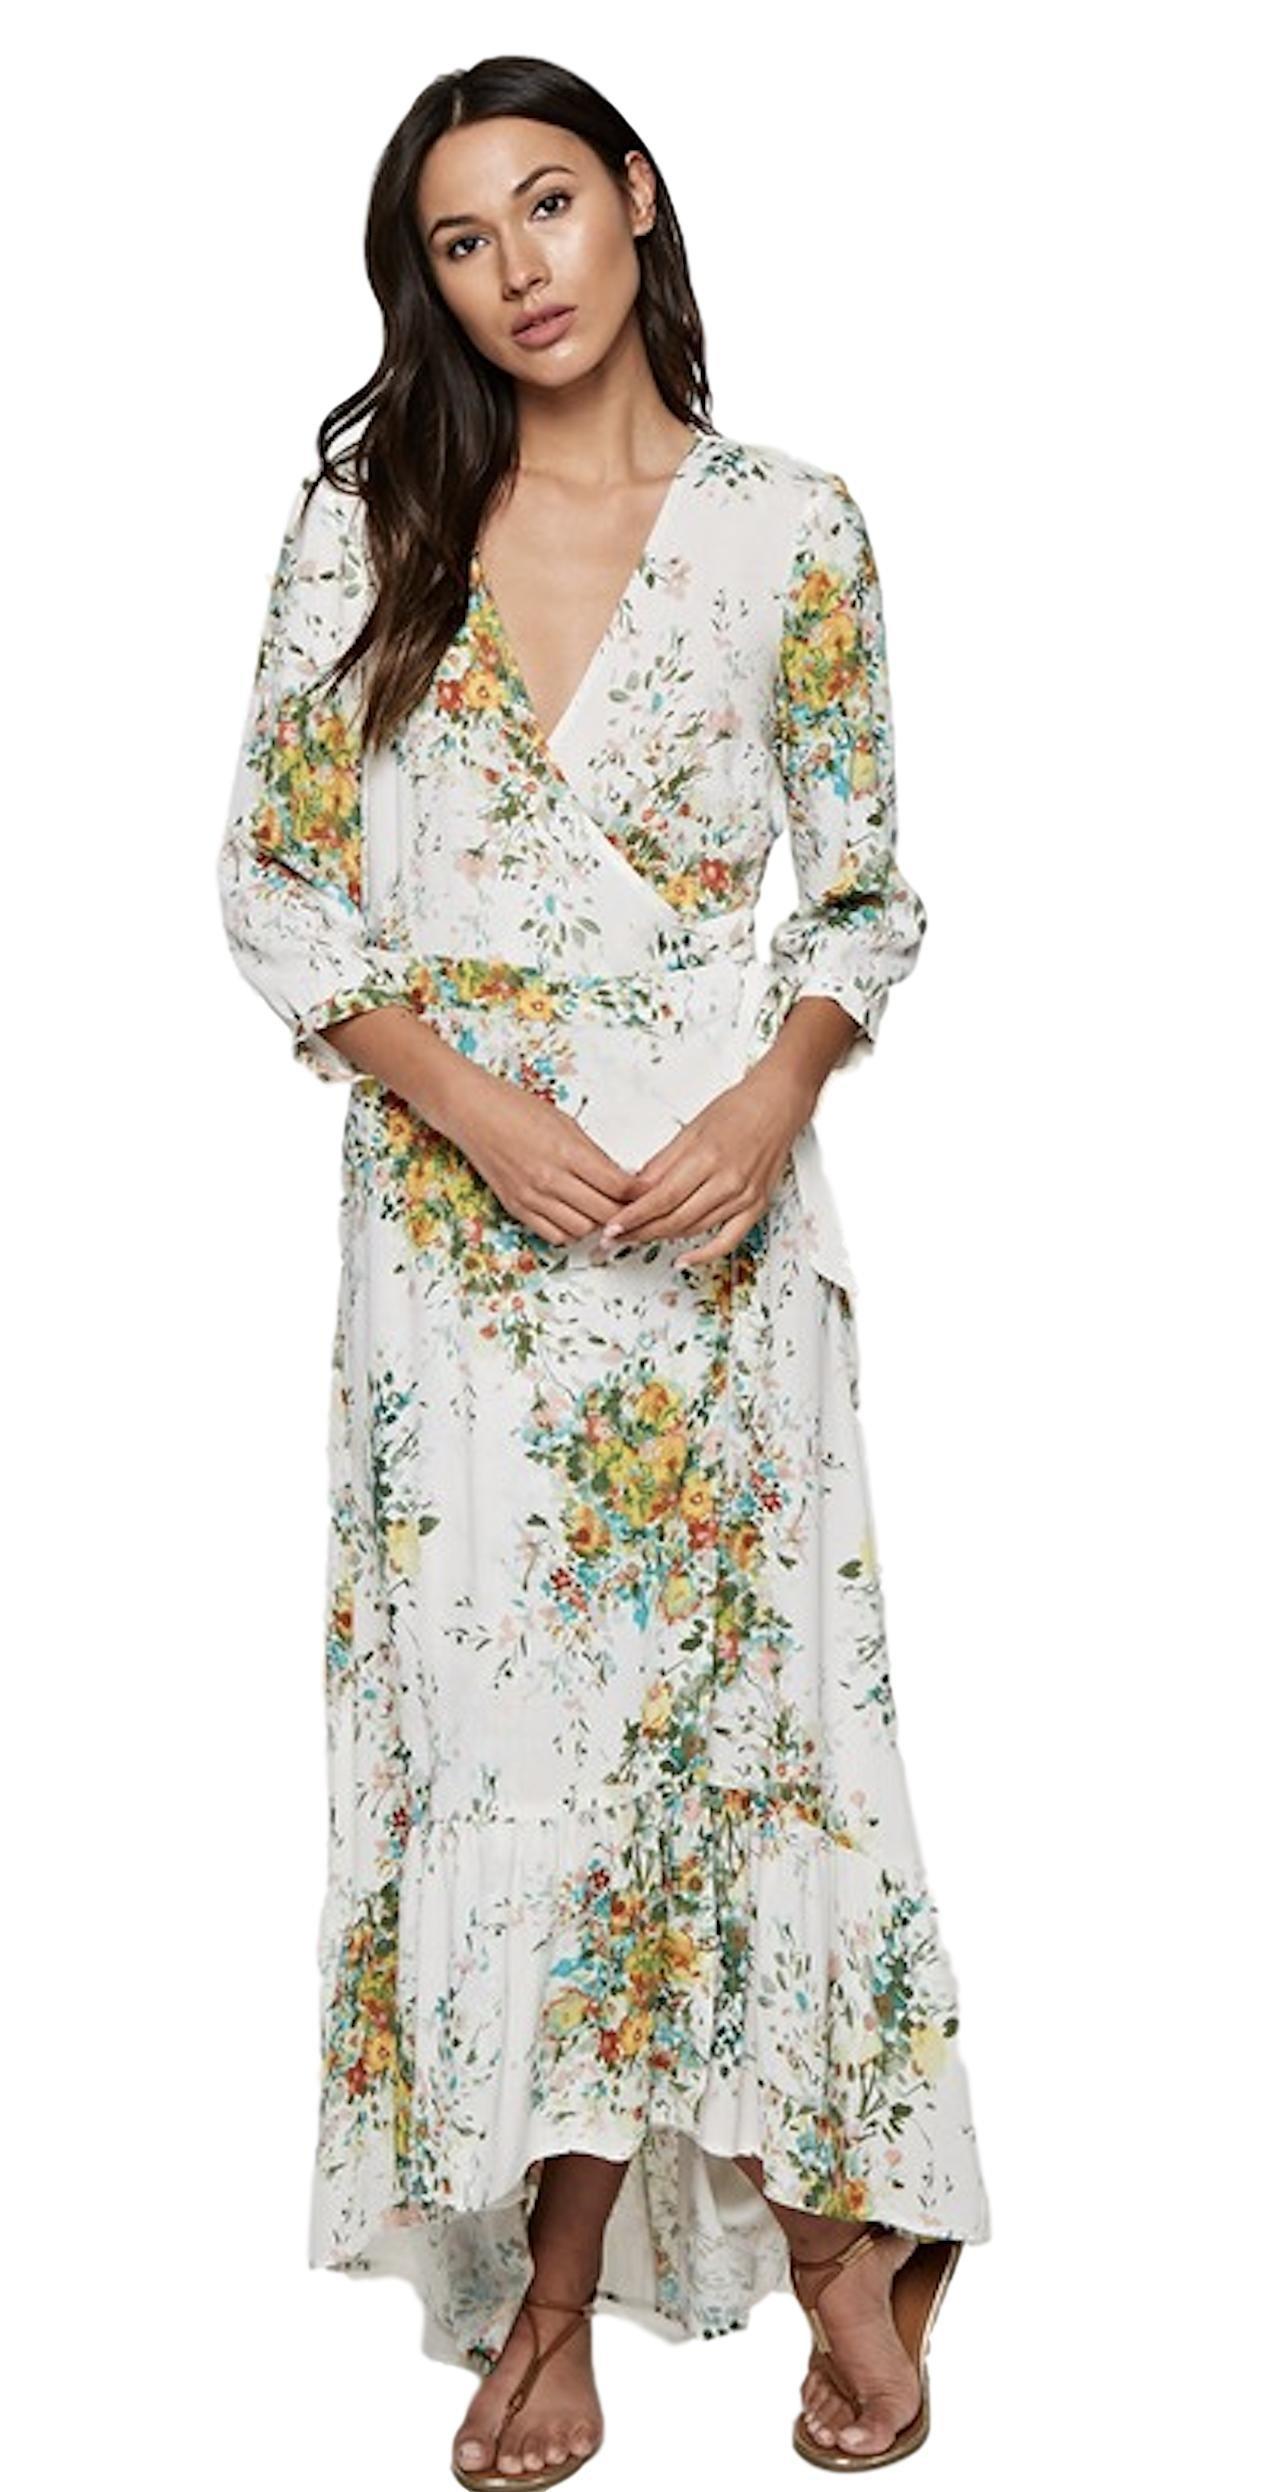 Love Stitch Women's Floral V-Neck Wrap Maxi Dress with 3/4 Sleeves and Ruffle Bottom Hi-Low Hem (Medium, Vanilla/Apple Multi)